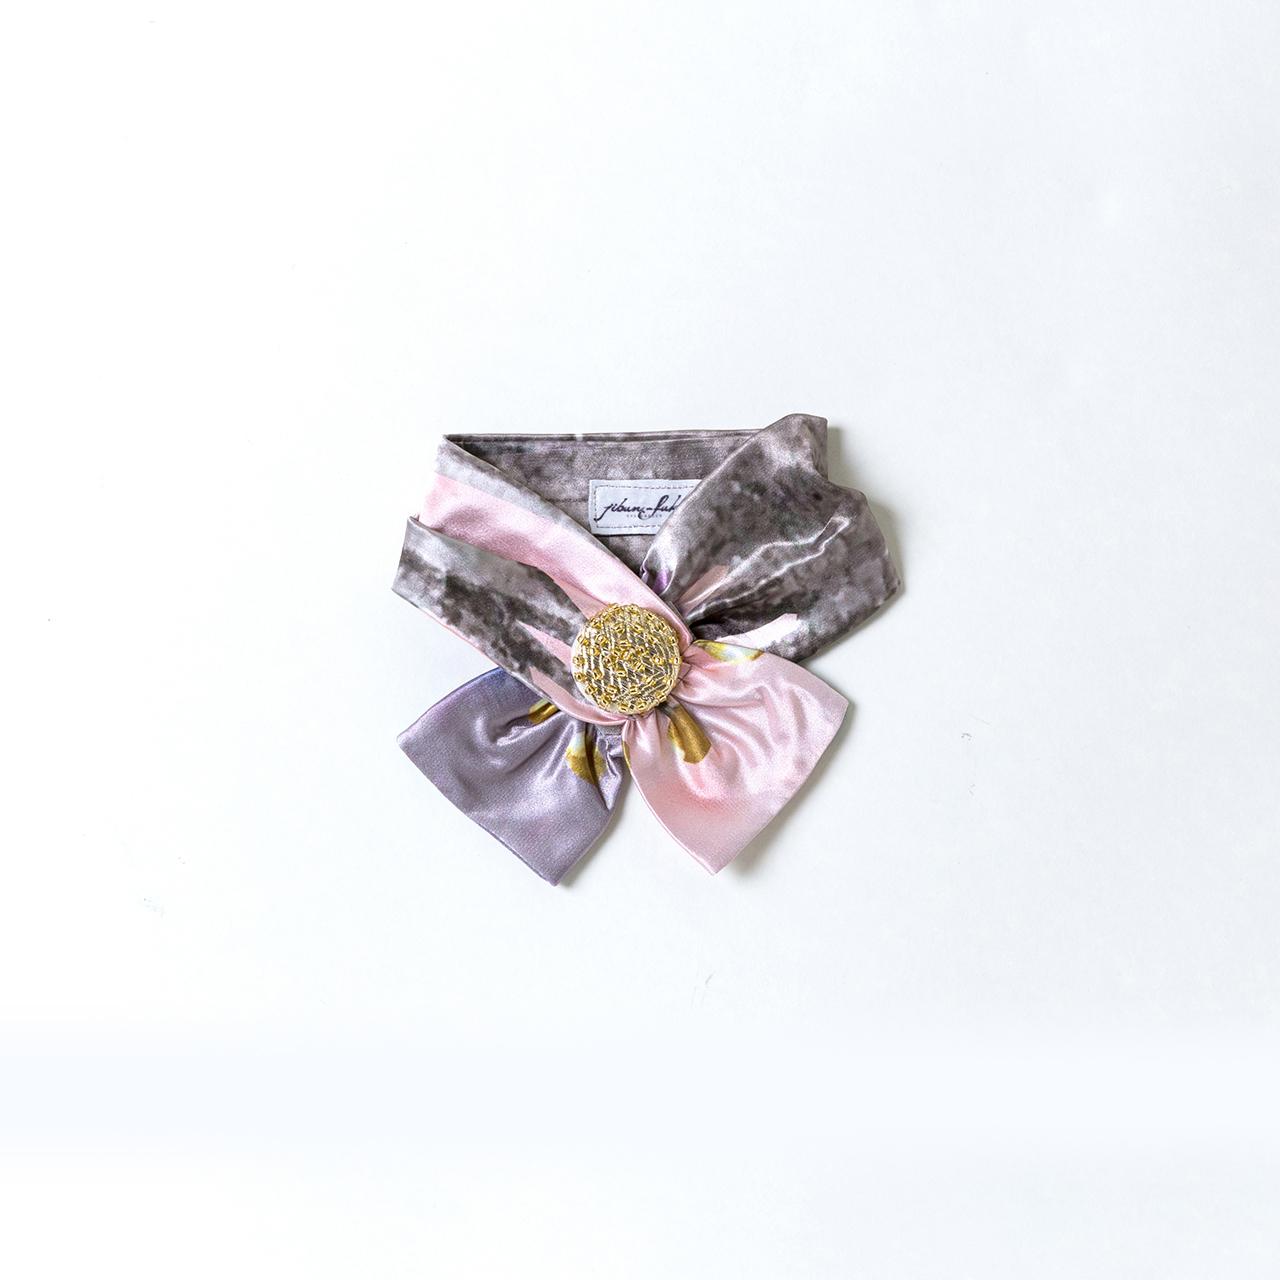 jibun-fuku DOG 【リボンカラー beads】DOGRB201861